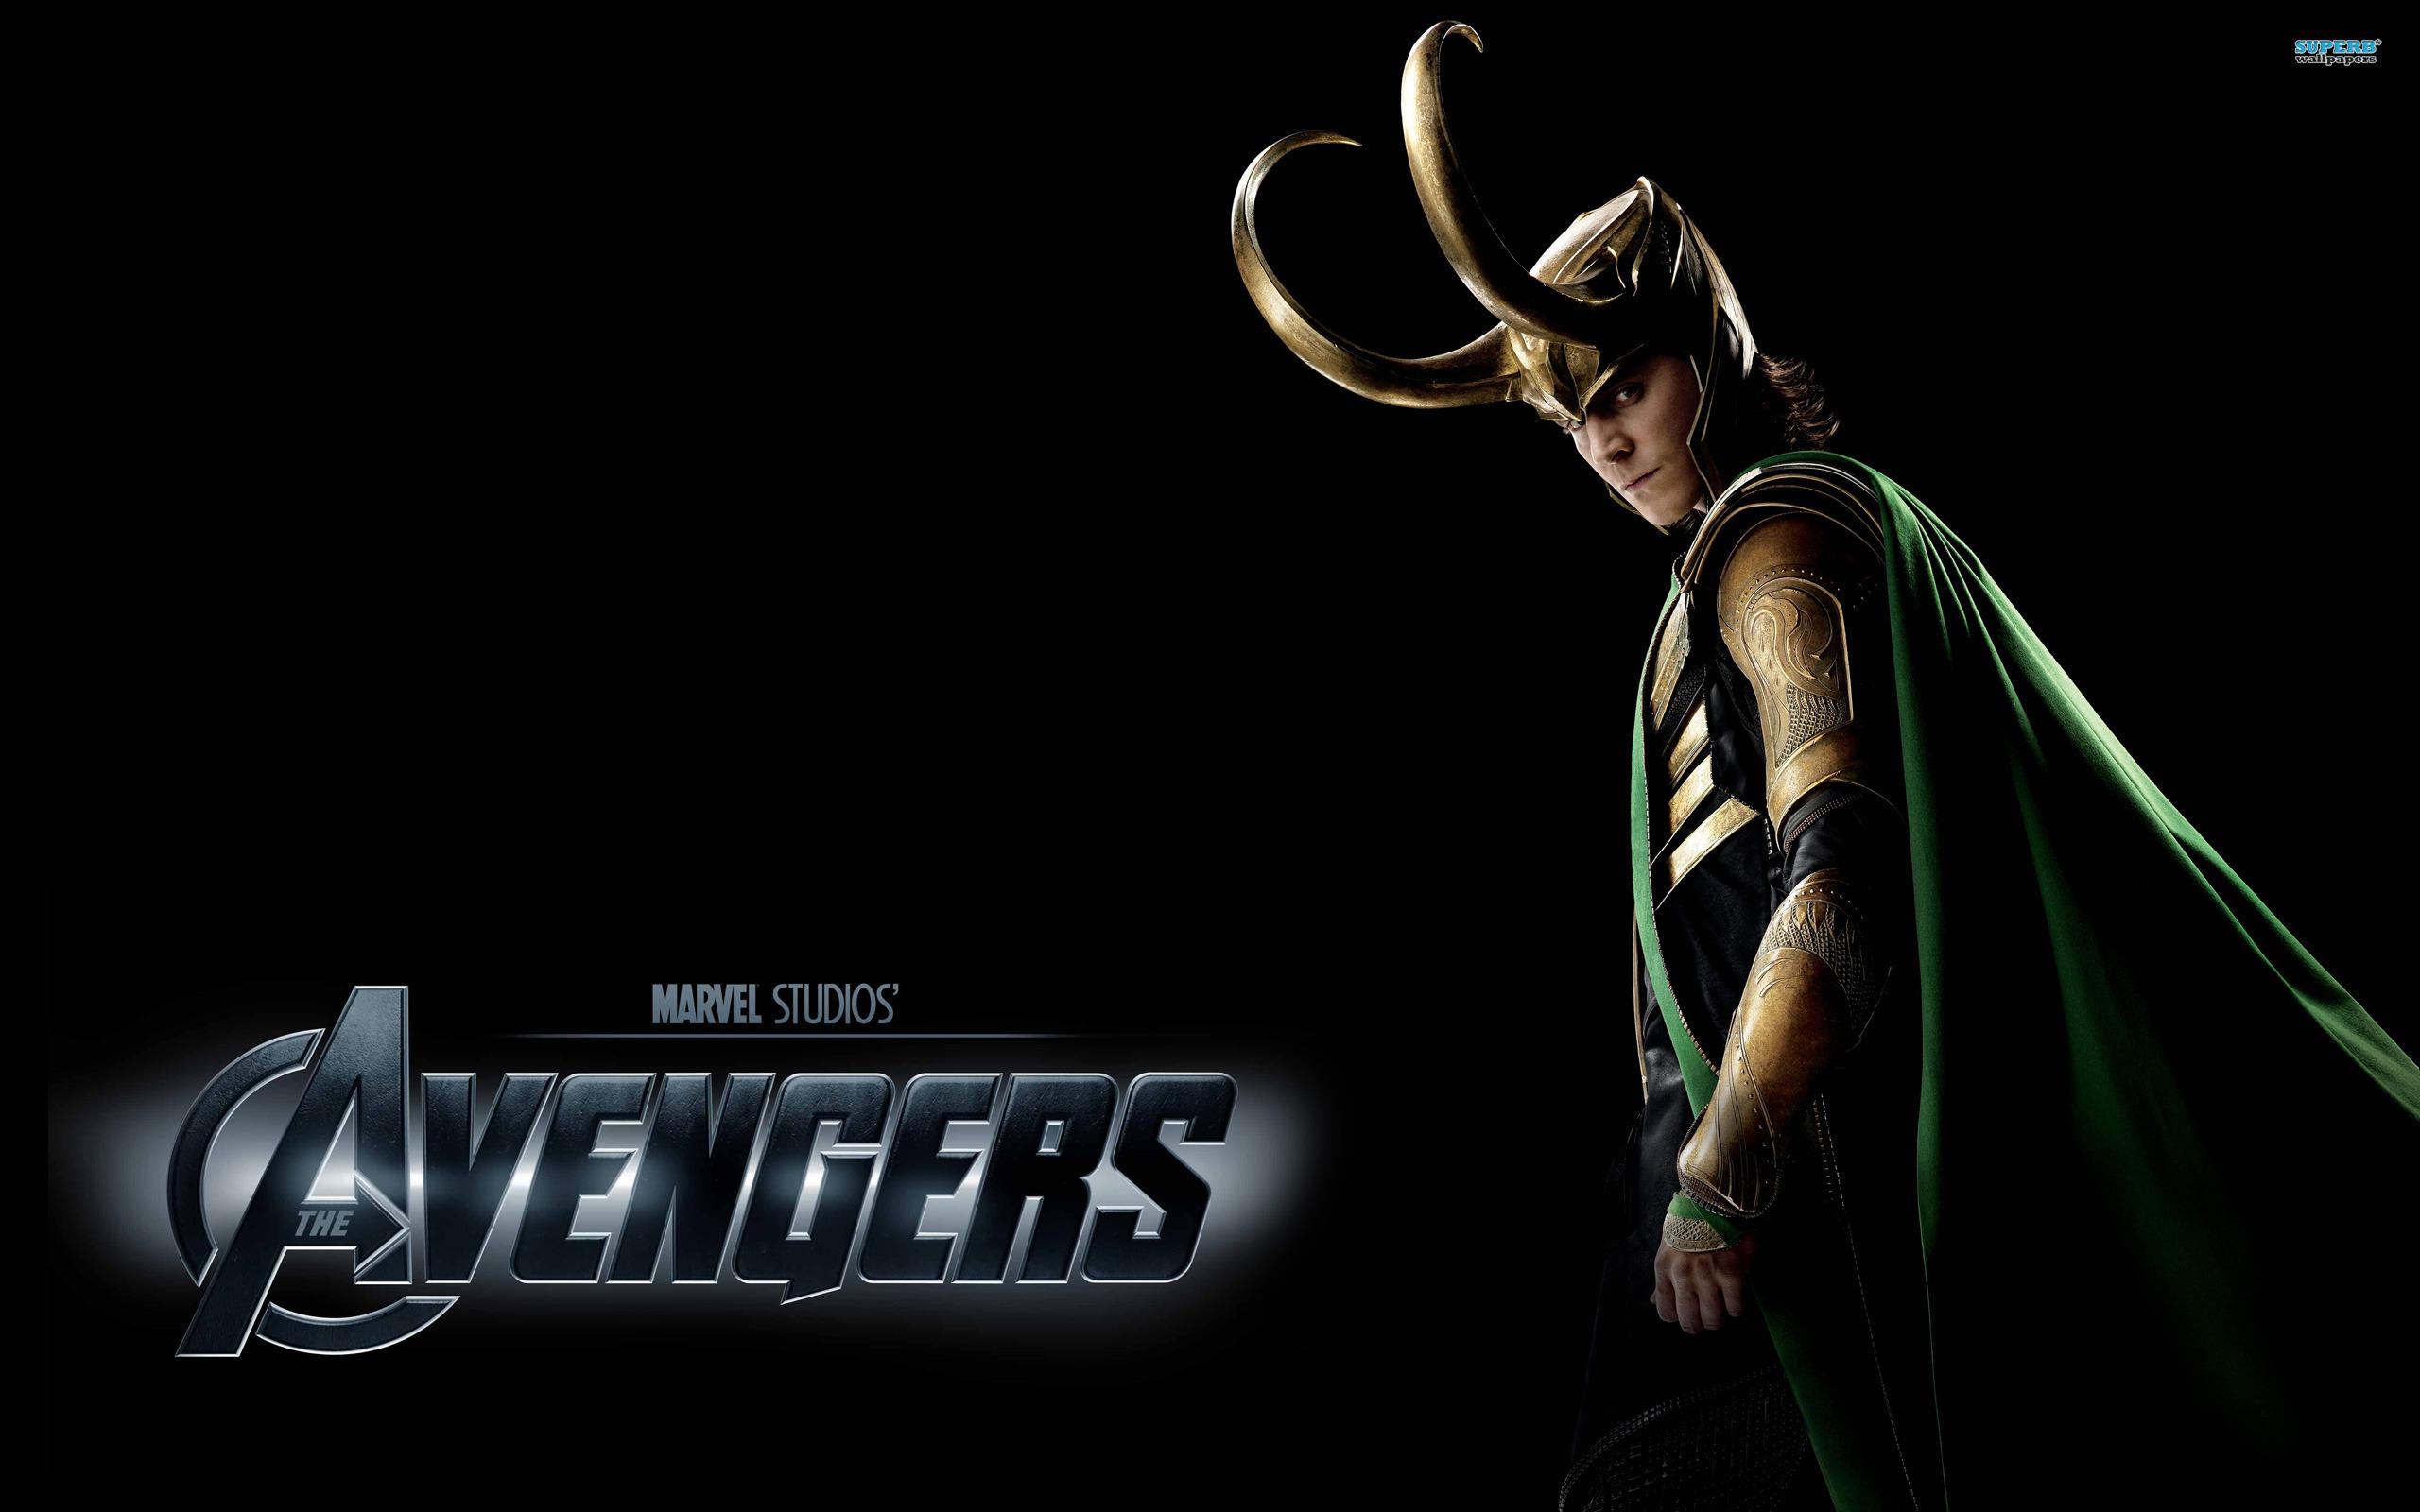 Avengers Wallpapers HD The Avengers Villain Loki HD Wallpapers 2560x1600